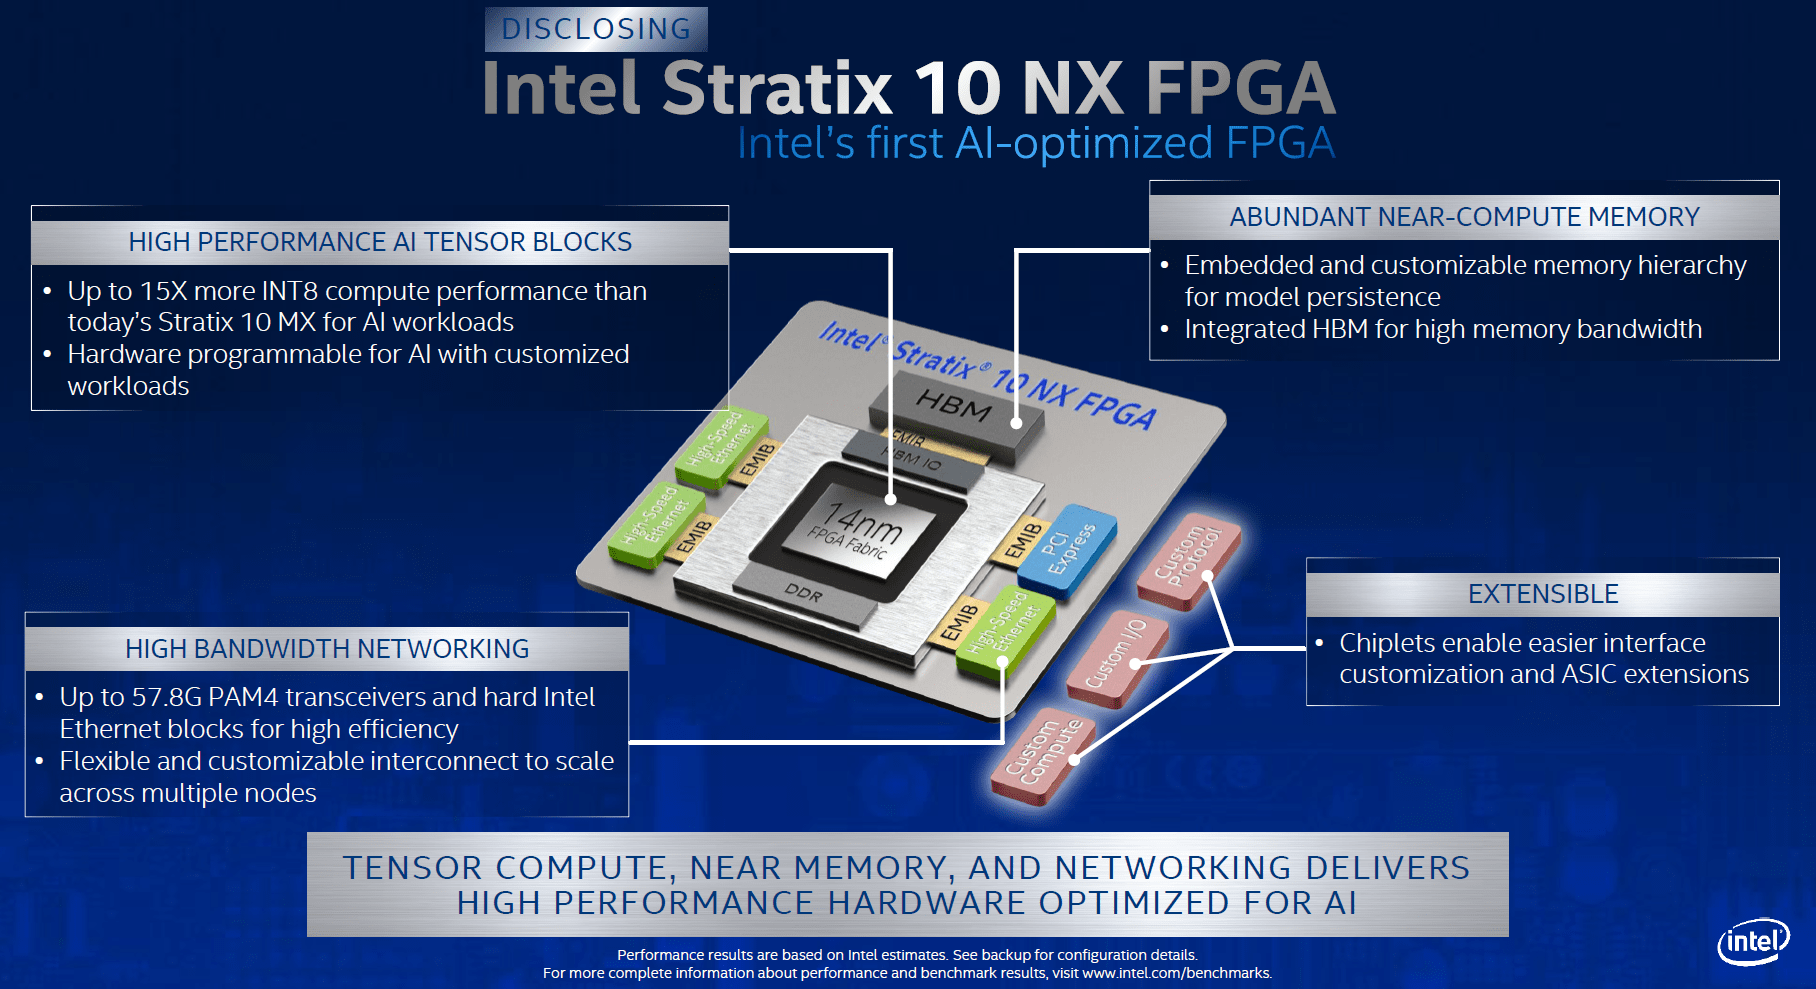 Intel Stratix 10 NX FPGA